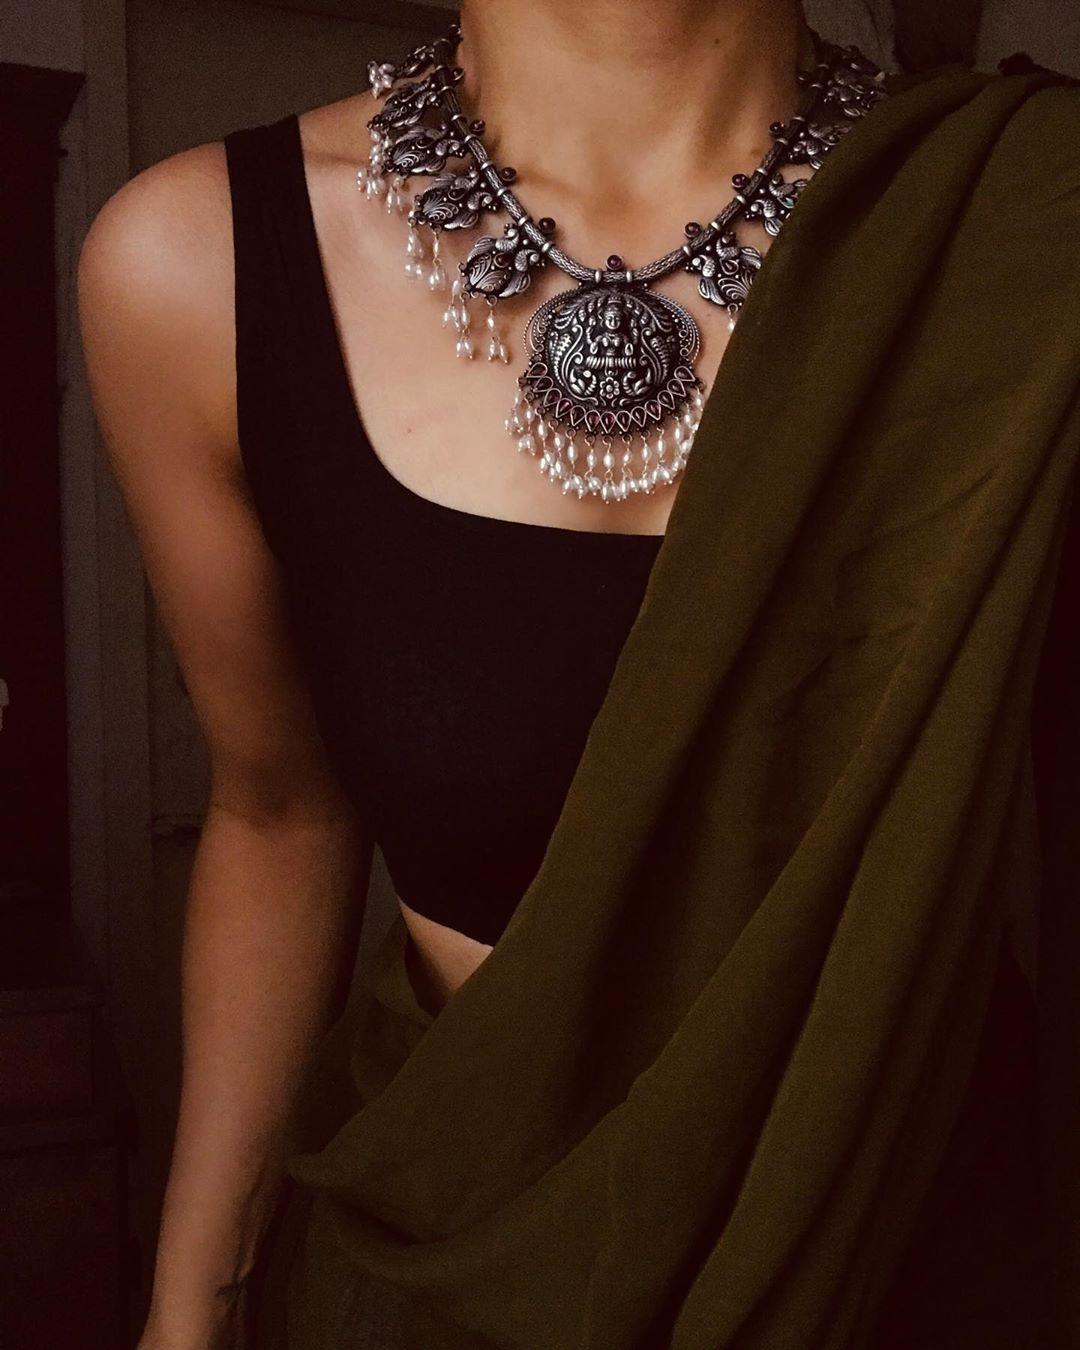 "Margazhii ® on Instagram: ""#styling | Jewellery @p"